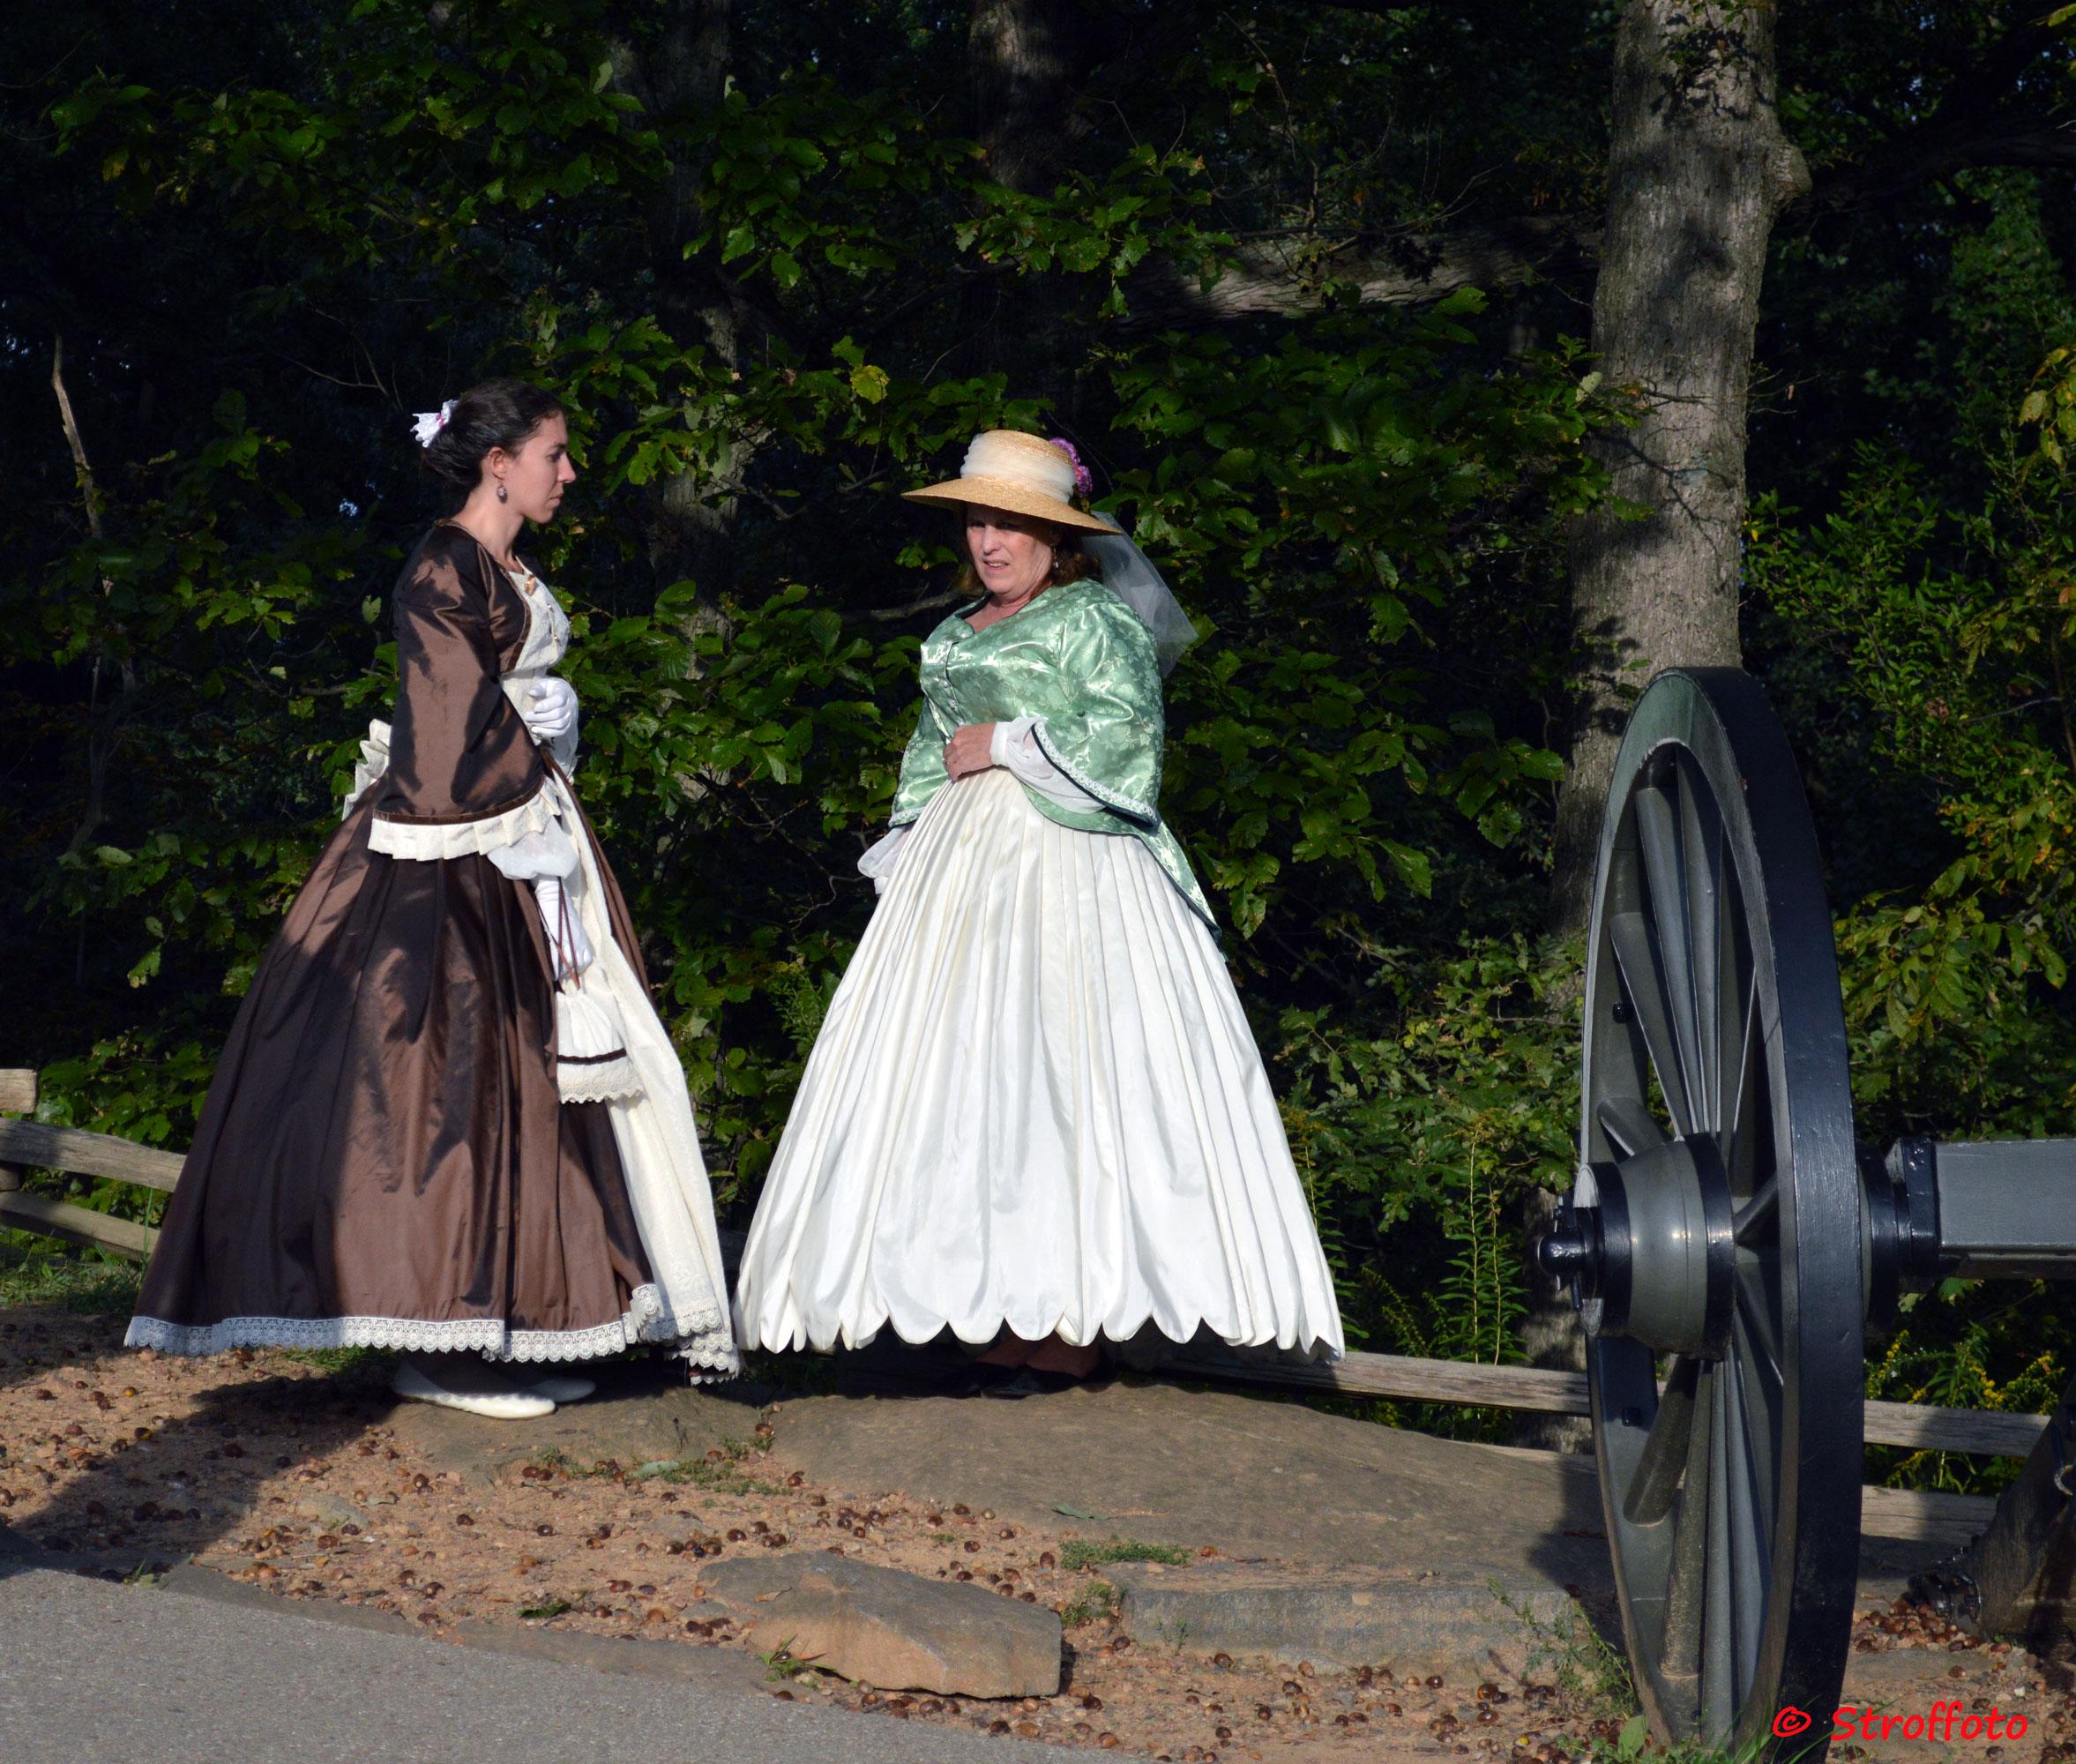 Some women dressed in costume in Gettysburg